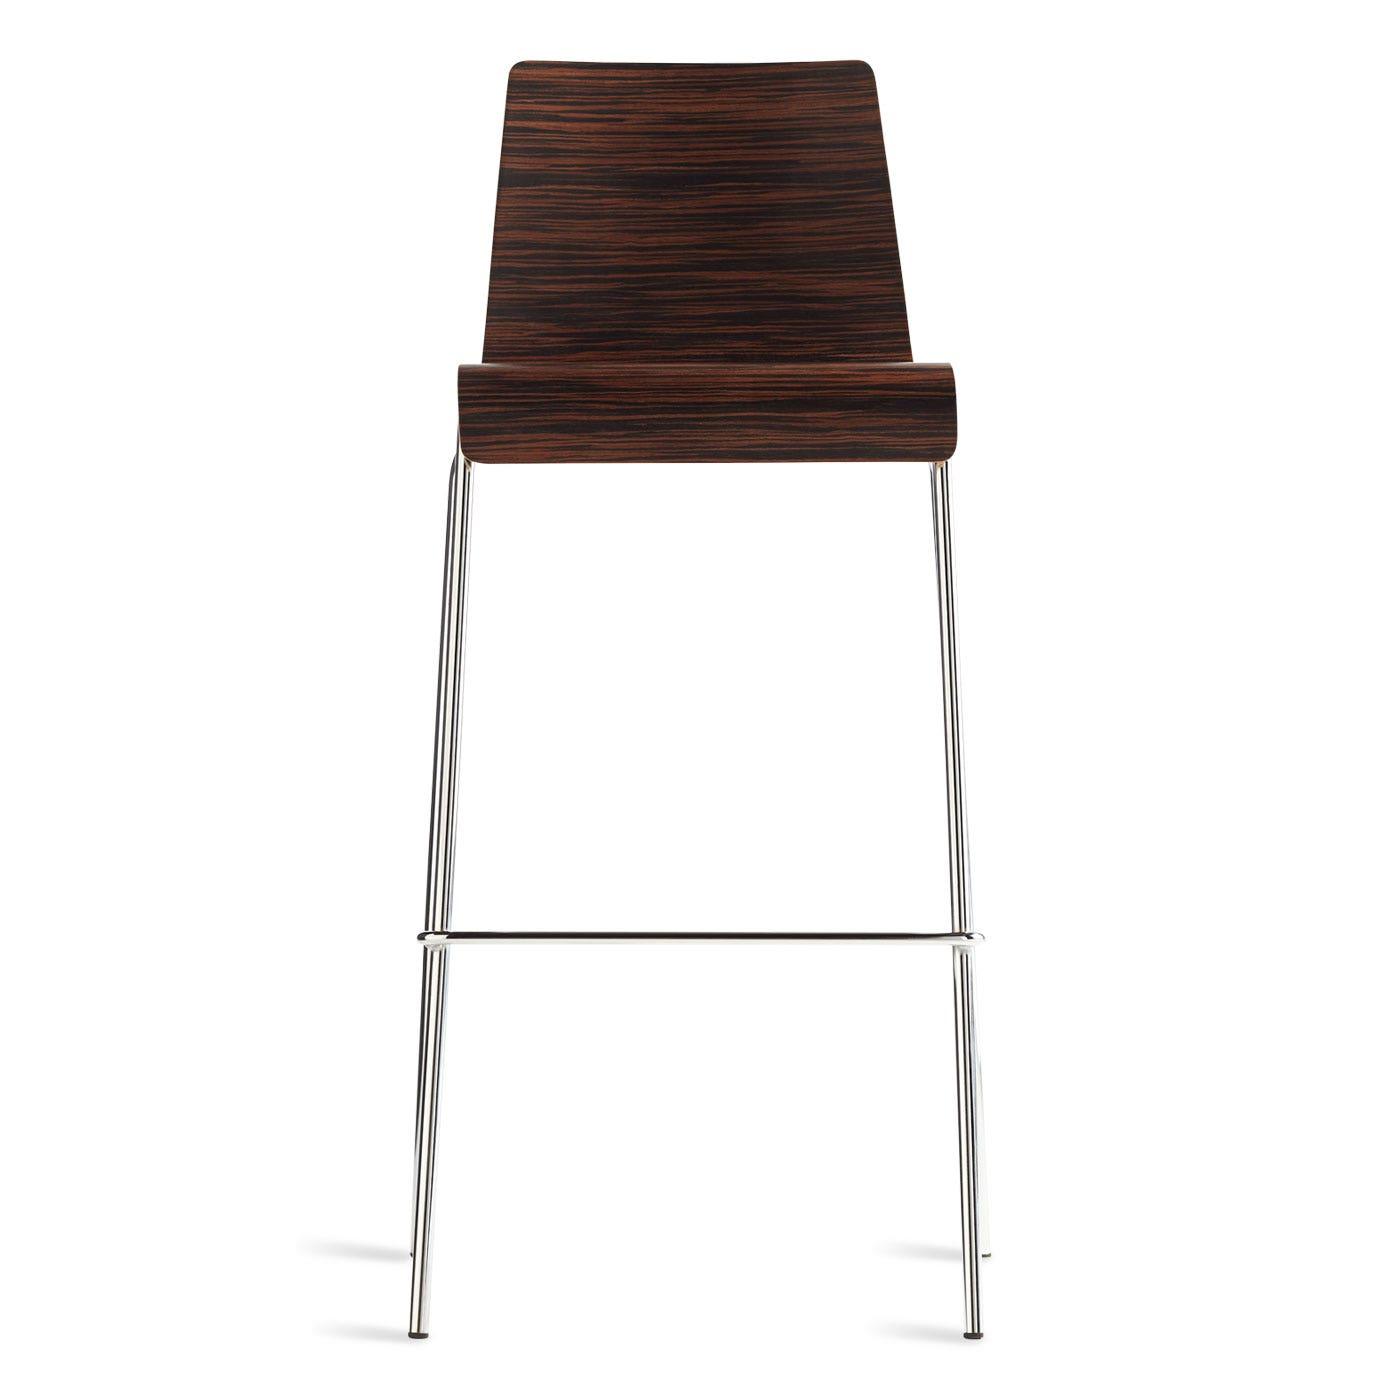 Previous image Barstool Barstool ...  sc 1 st  Blu Dot & Barstool Barstool - Modern Wood Barstool | Blu Dot islam-shia.org